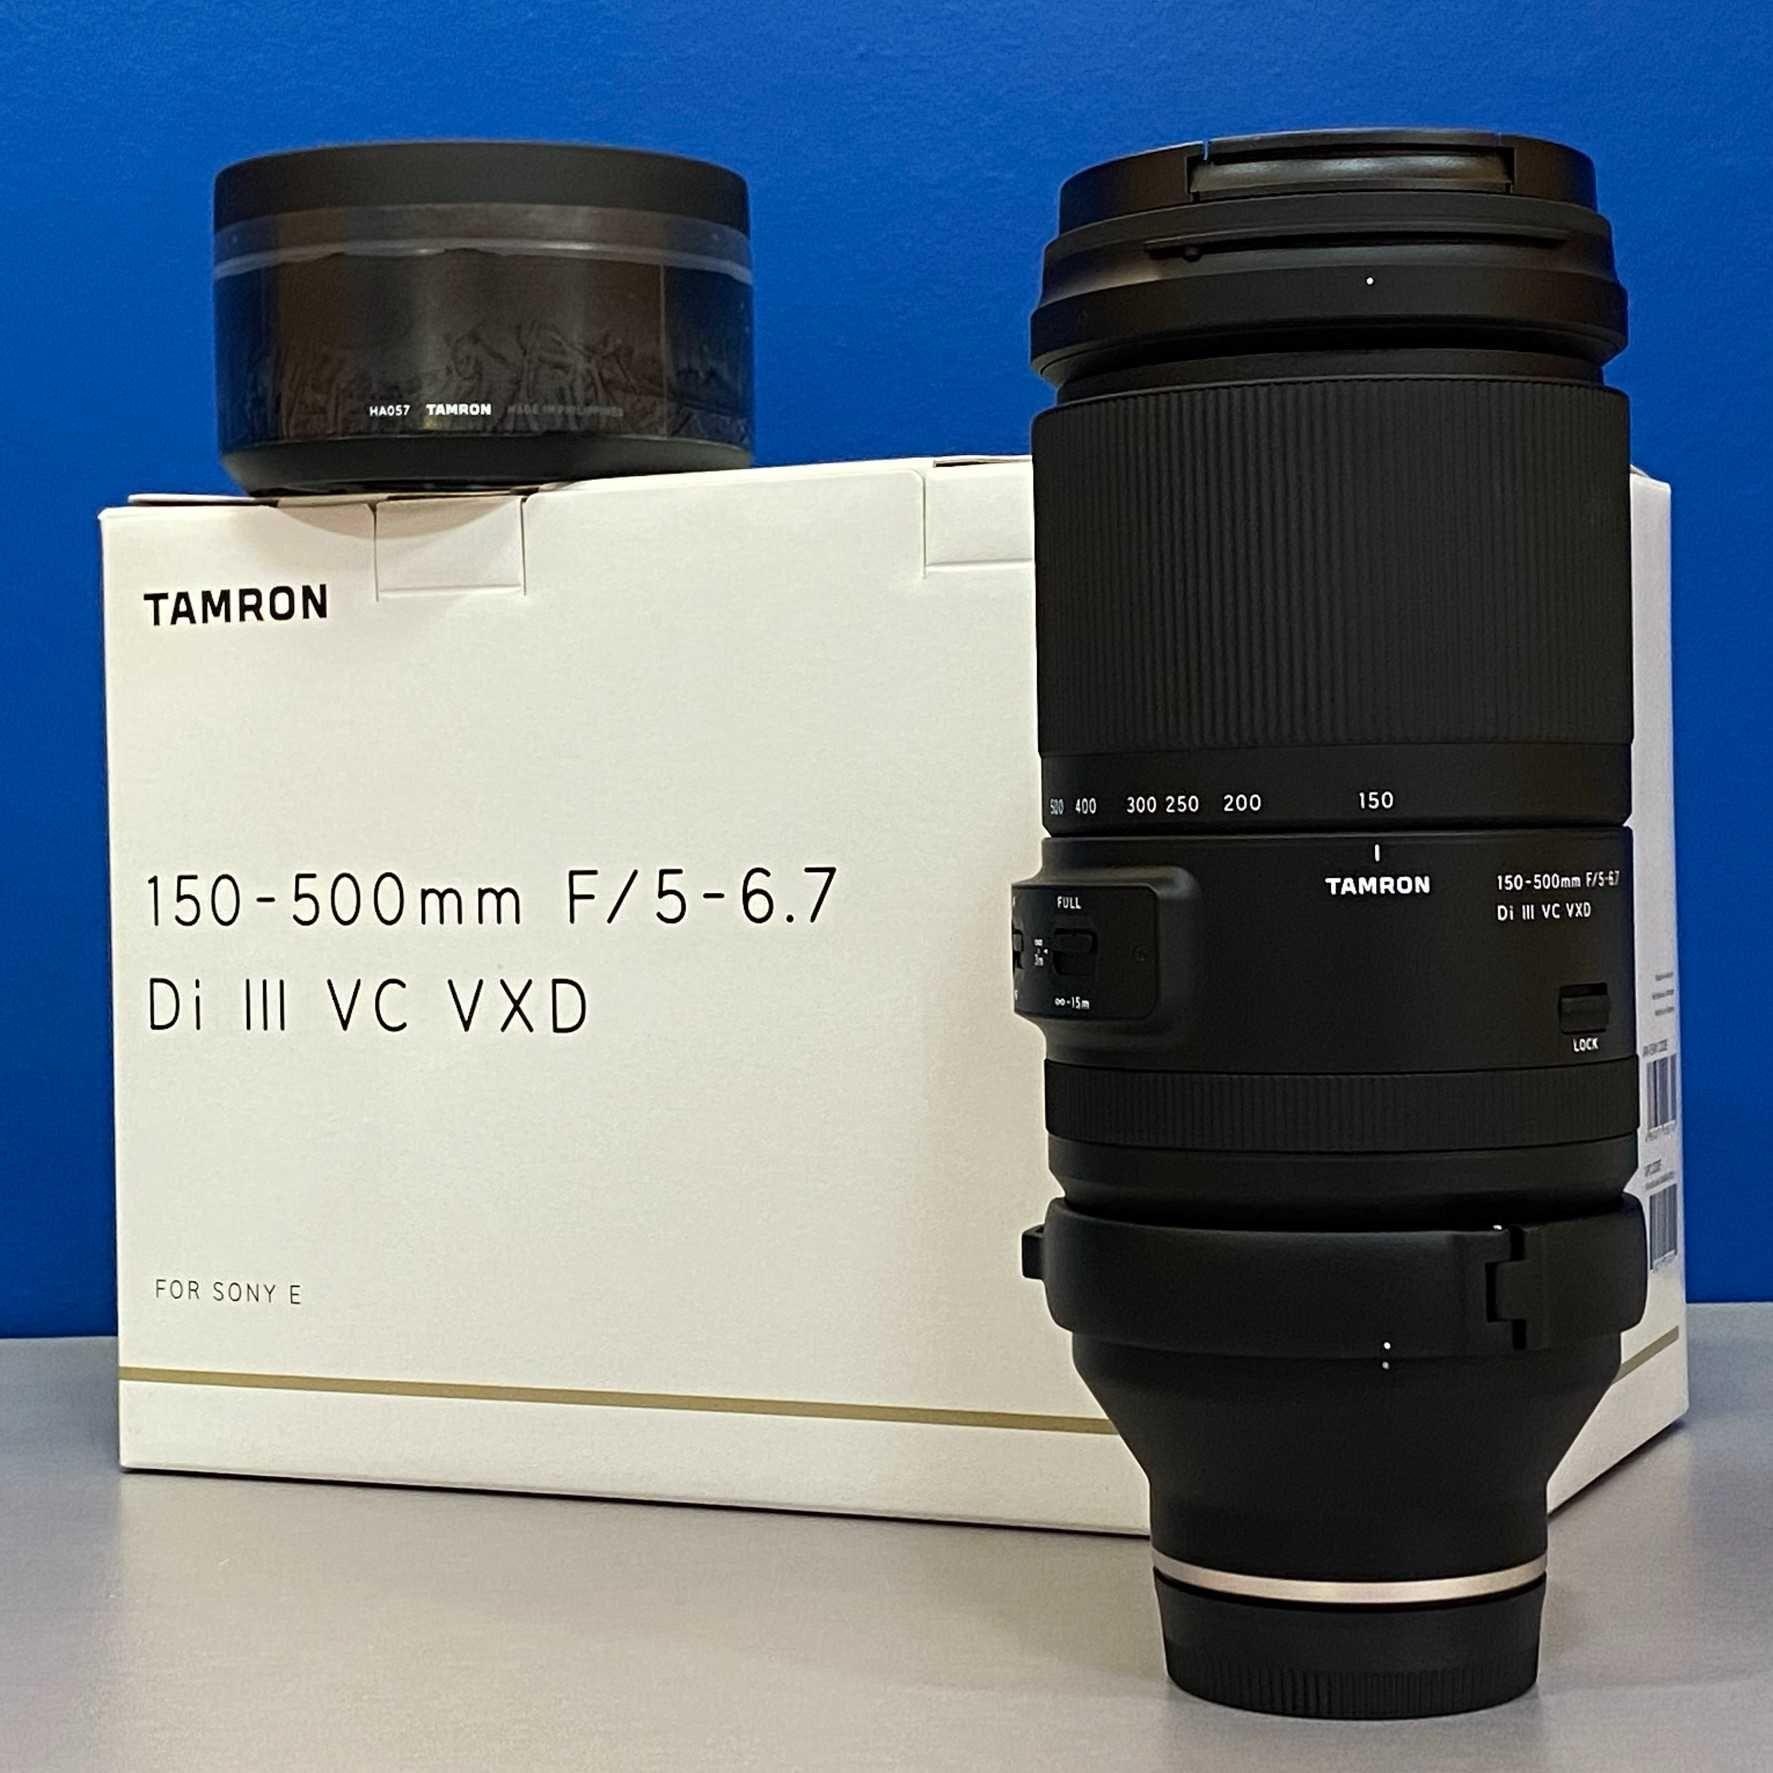 Tamron 150-500mm f/5-6.7 Di III VC VXD (Sony FE) - 5 ANOS DE GARANTIA